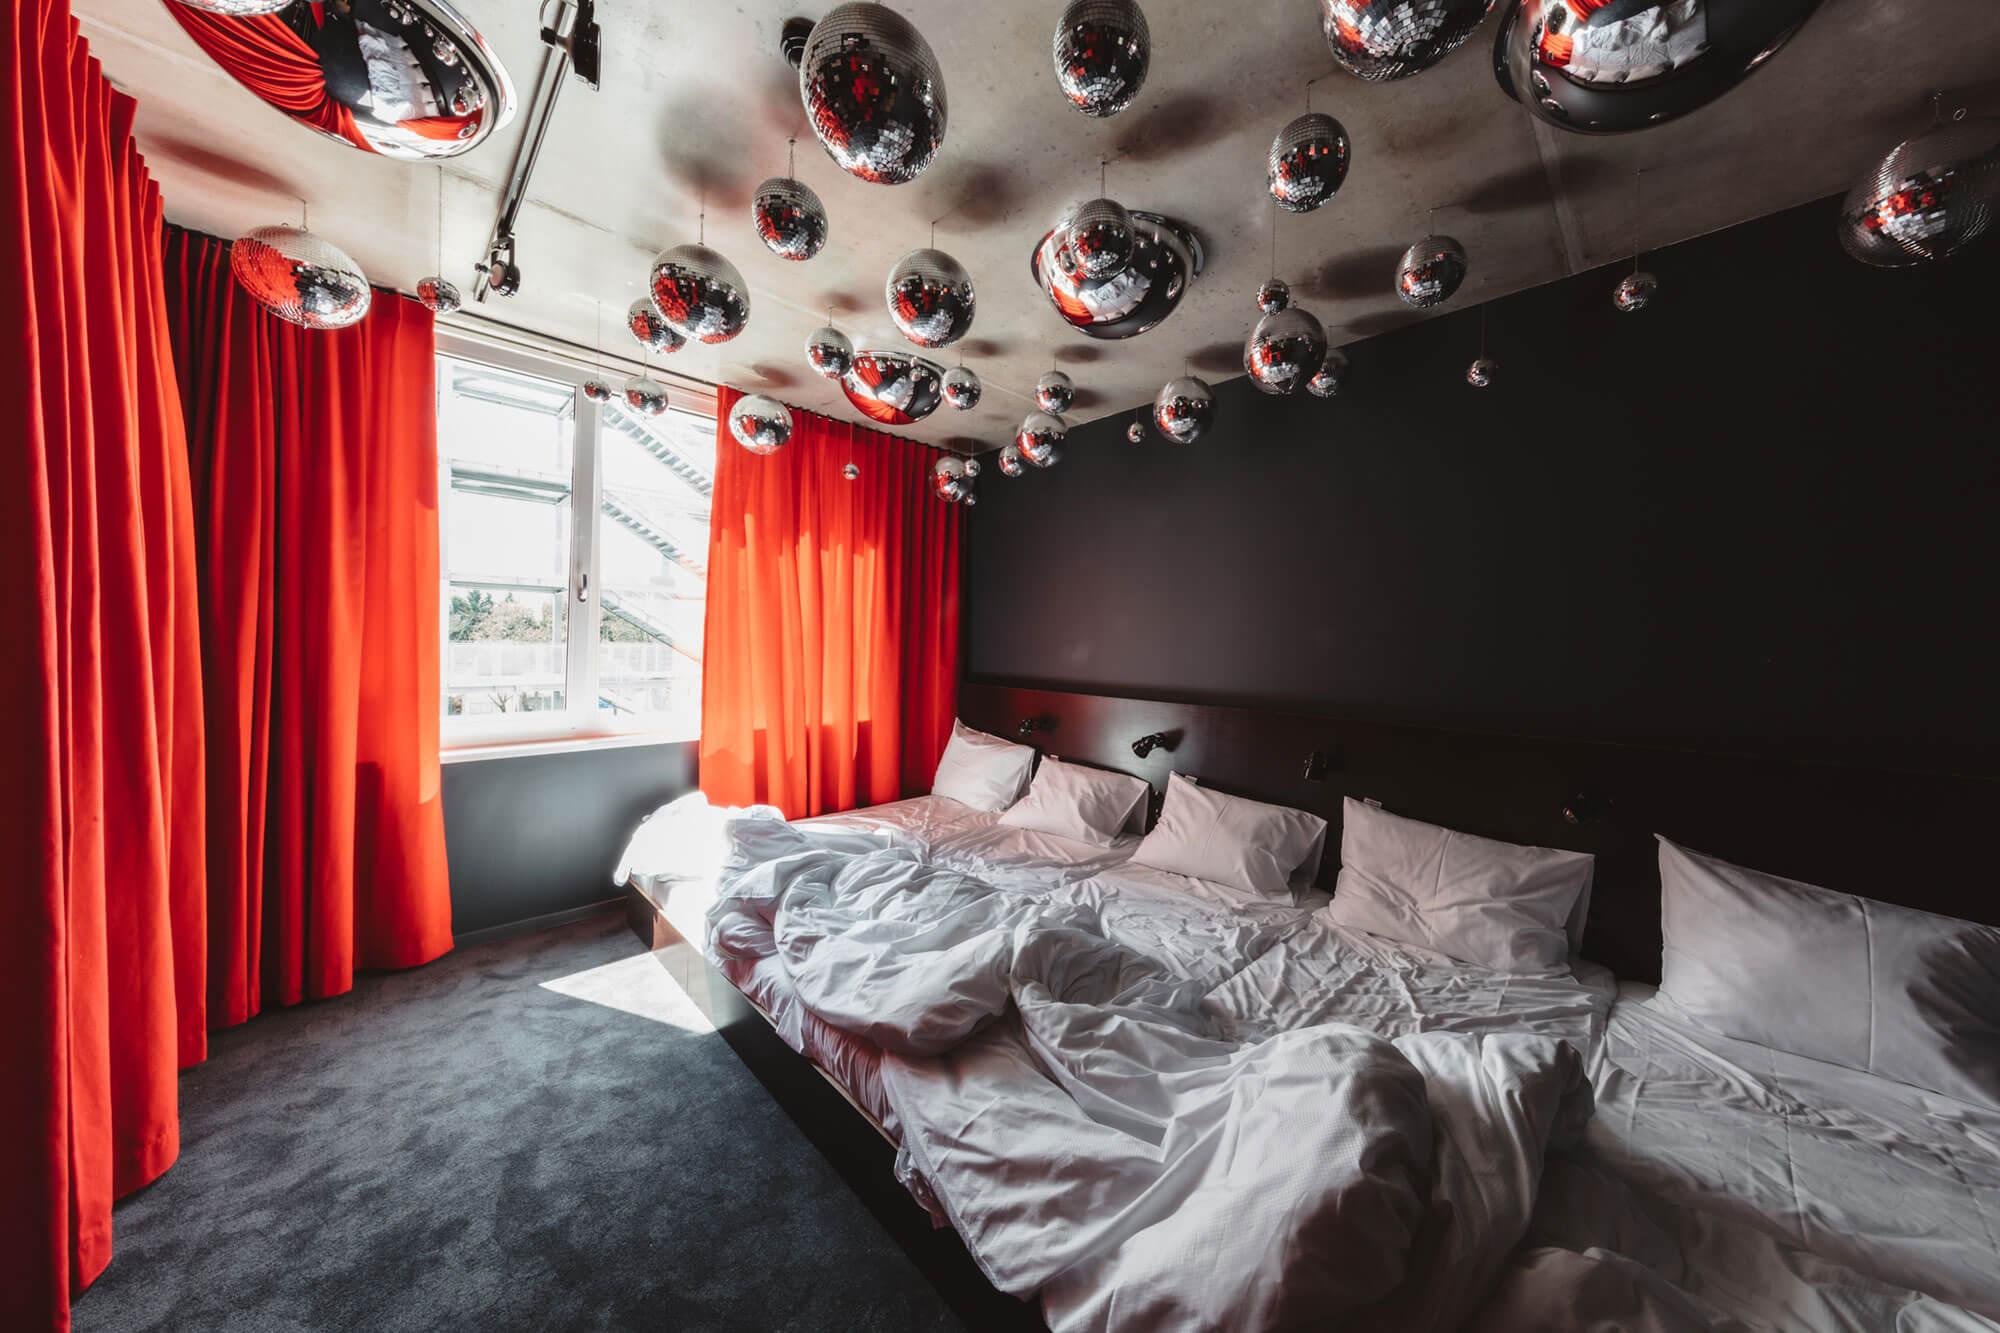 Superbude-Hotel-Hostel-Bachhuber-Hoteleinrichtungen-11